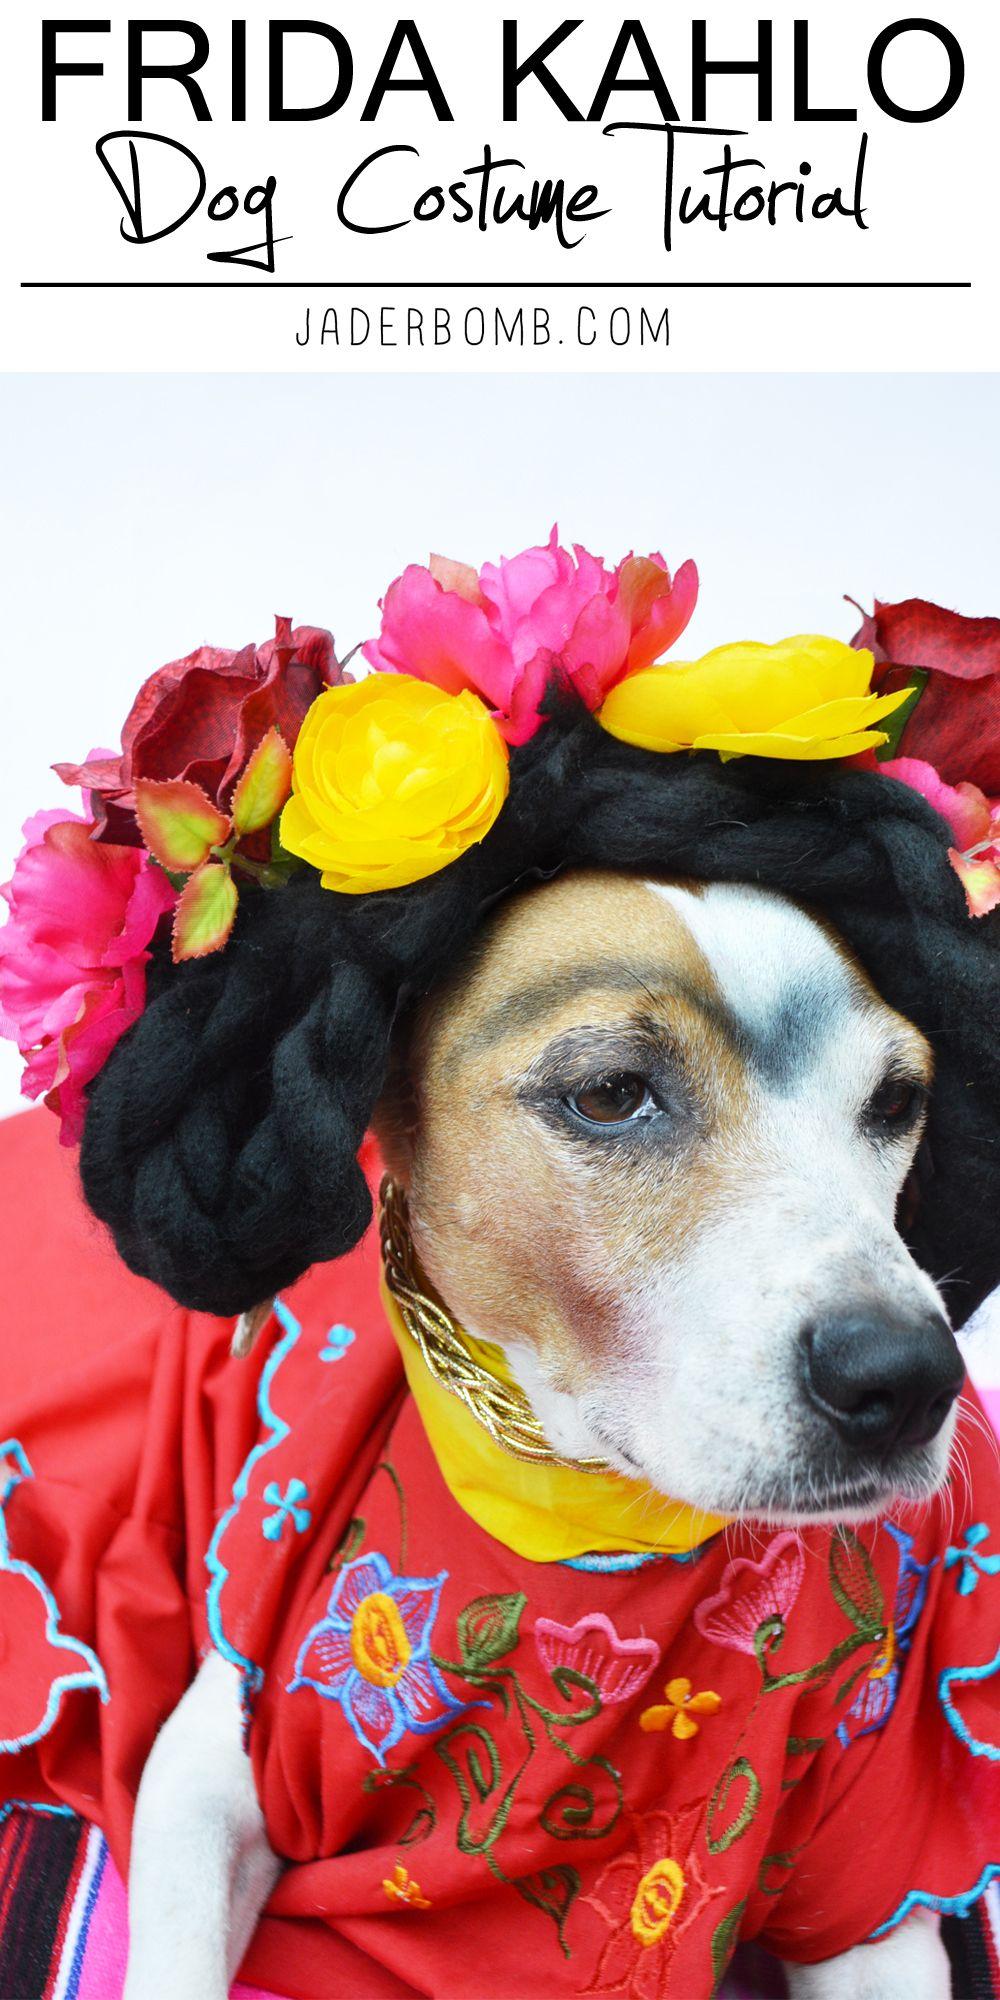 Frida Kahlo Dog Costume Diy Halloween Dog Costume Diy Dog Costumes Dog Costumes Halloween Large Dog Halloween Costumes